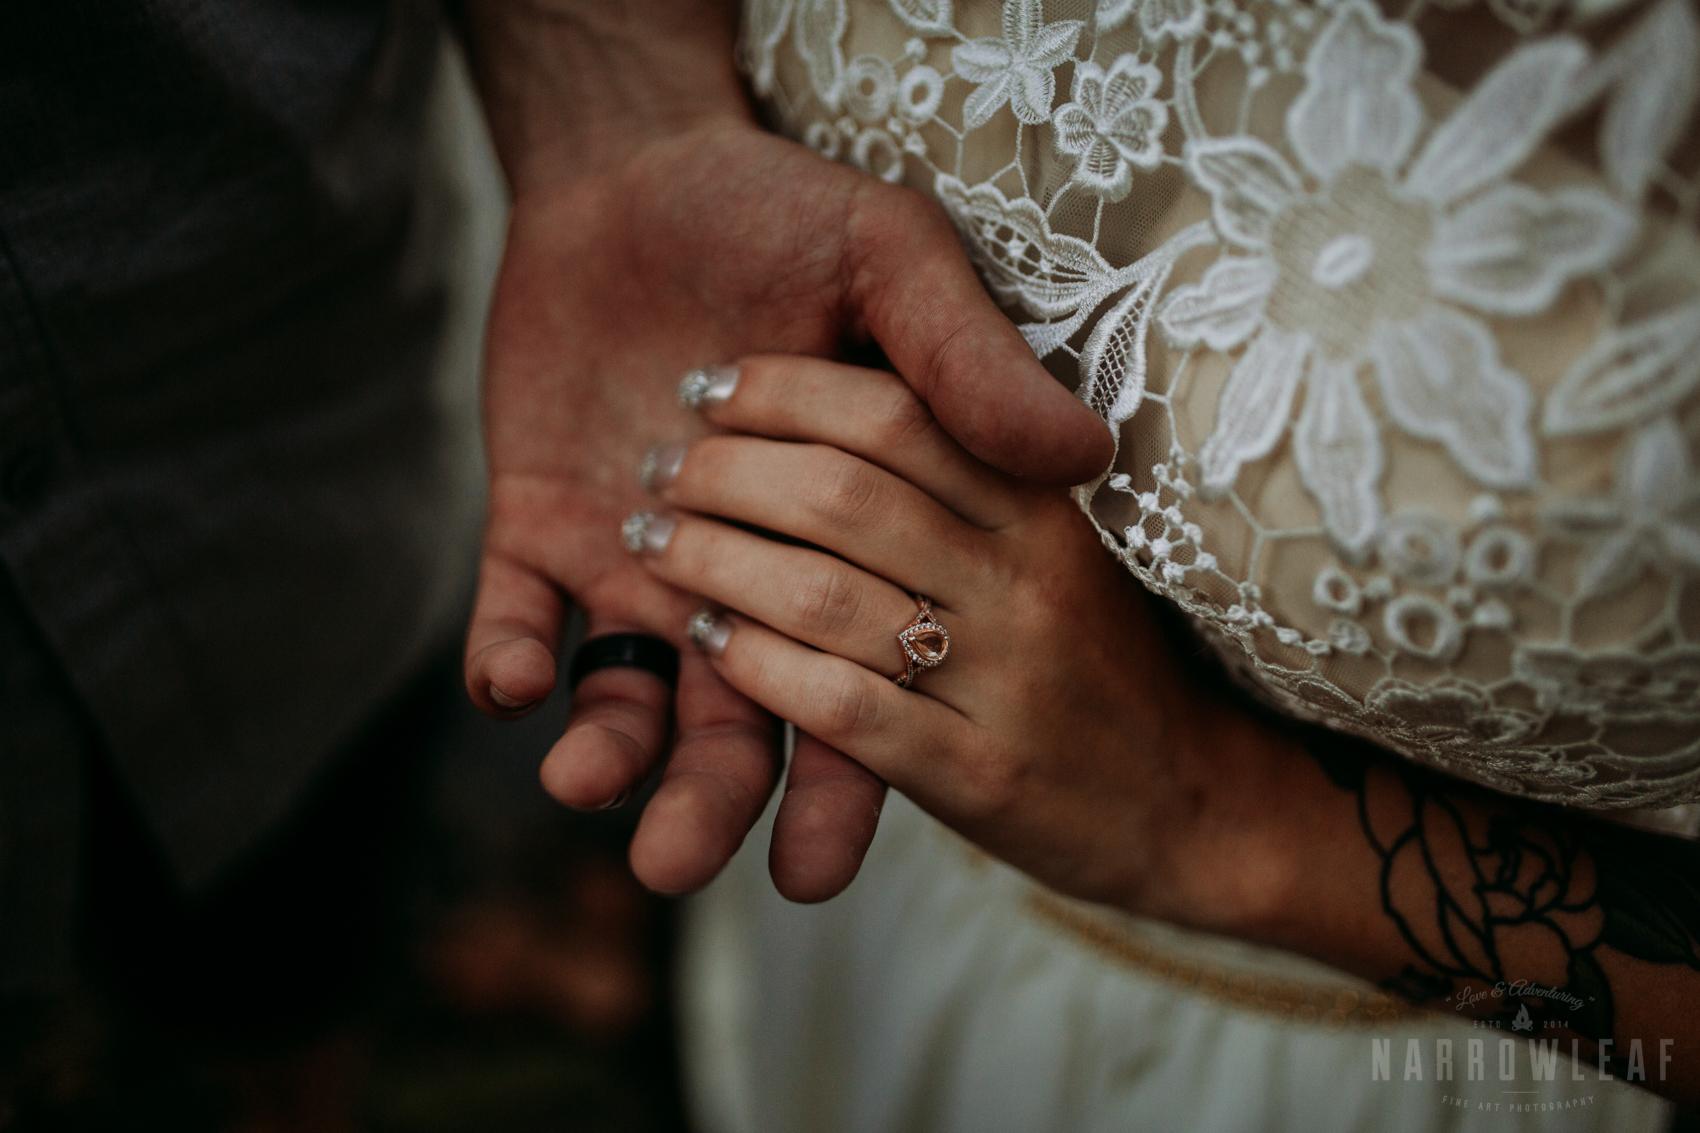 minnesota-outdoor-wedding-elopement-NarrowLeaf_Love_&_Adventure_Photography-55.jpg